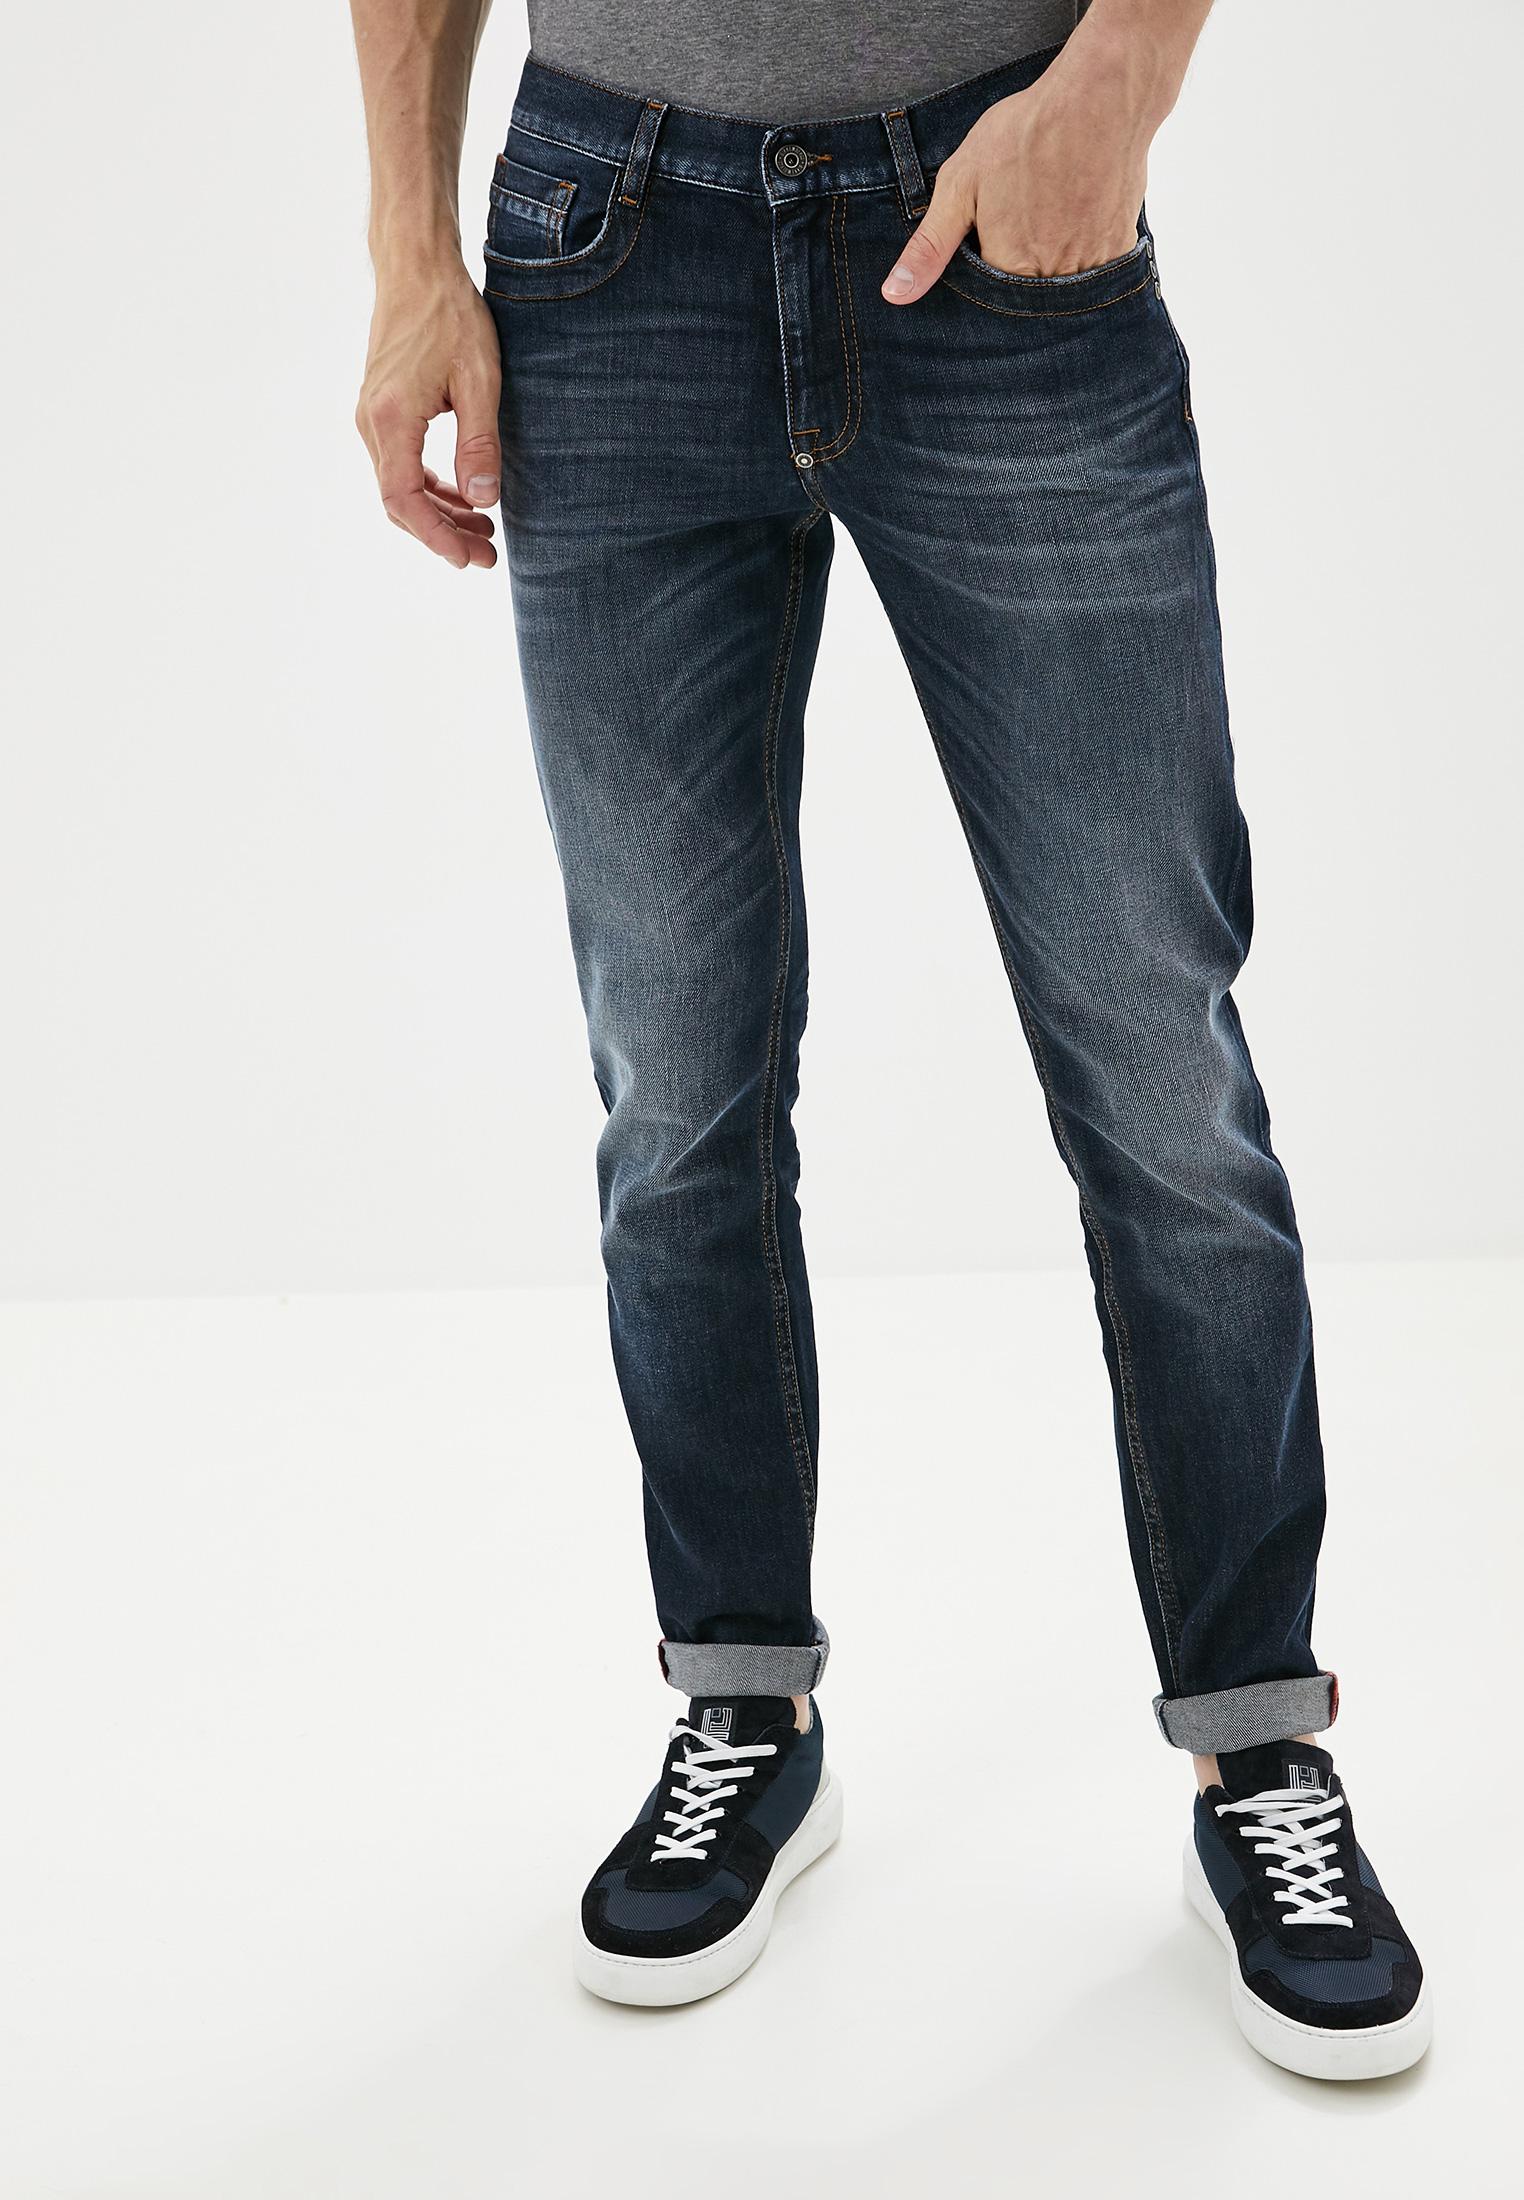 Зауженные джинсы Bikkembergs C Q 101 01 S 3333